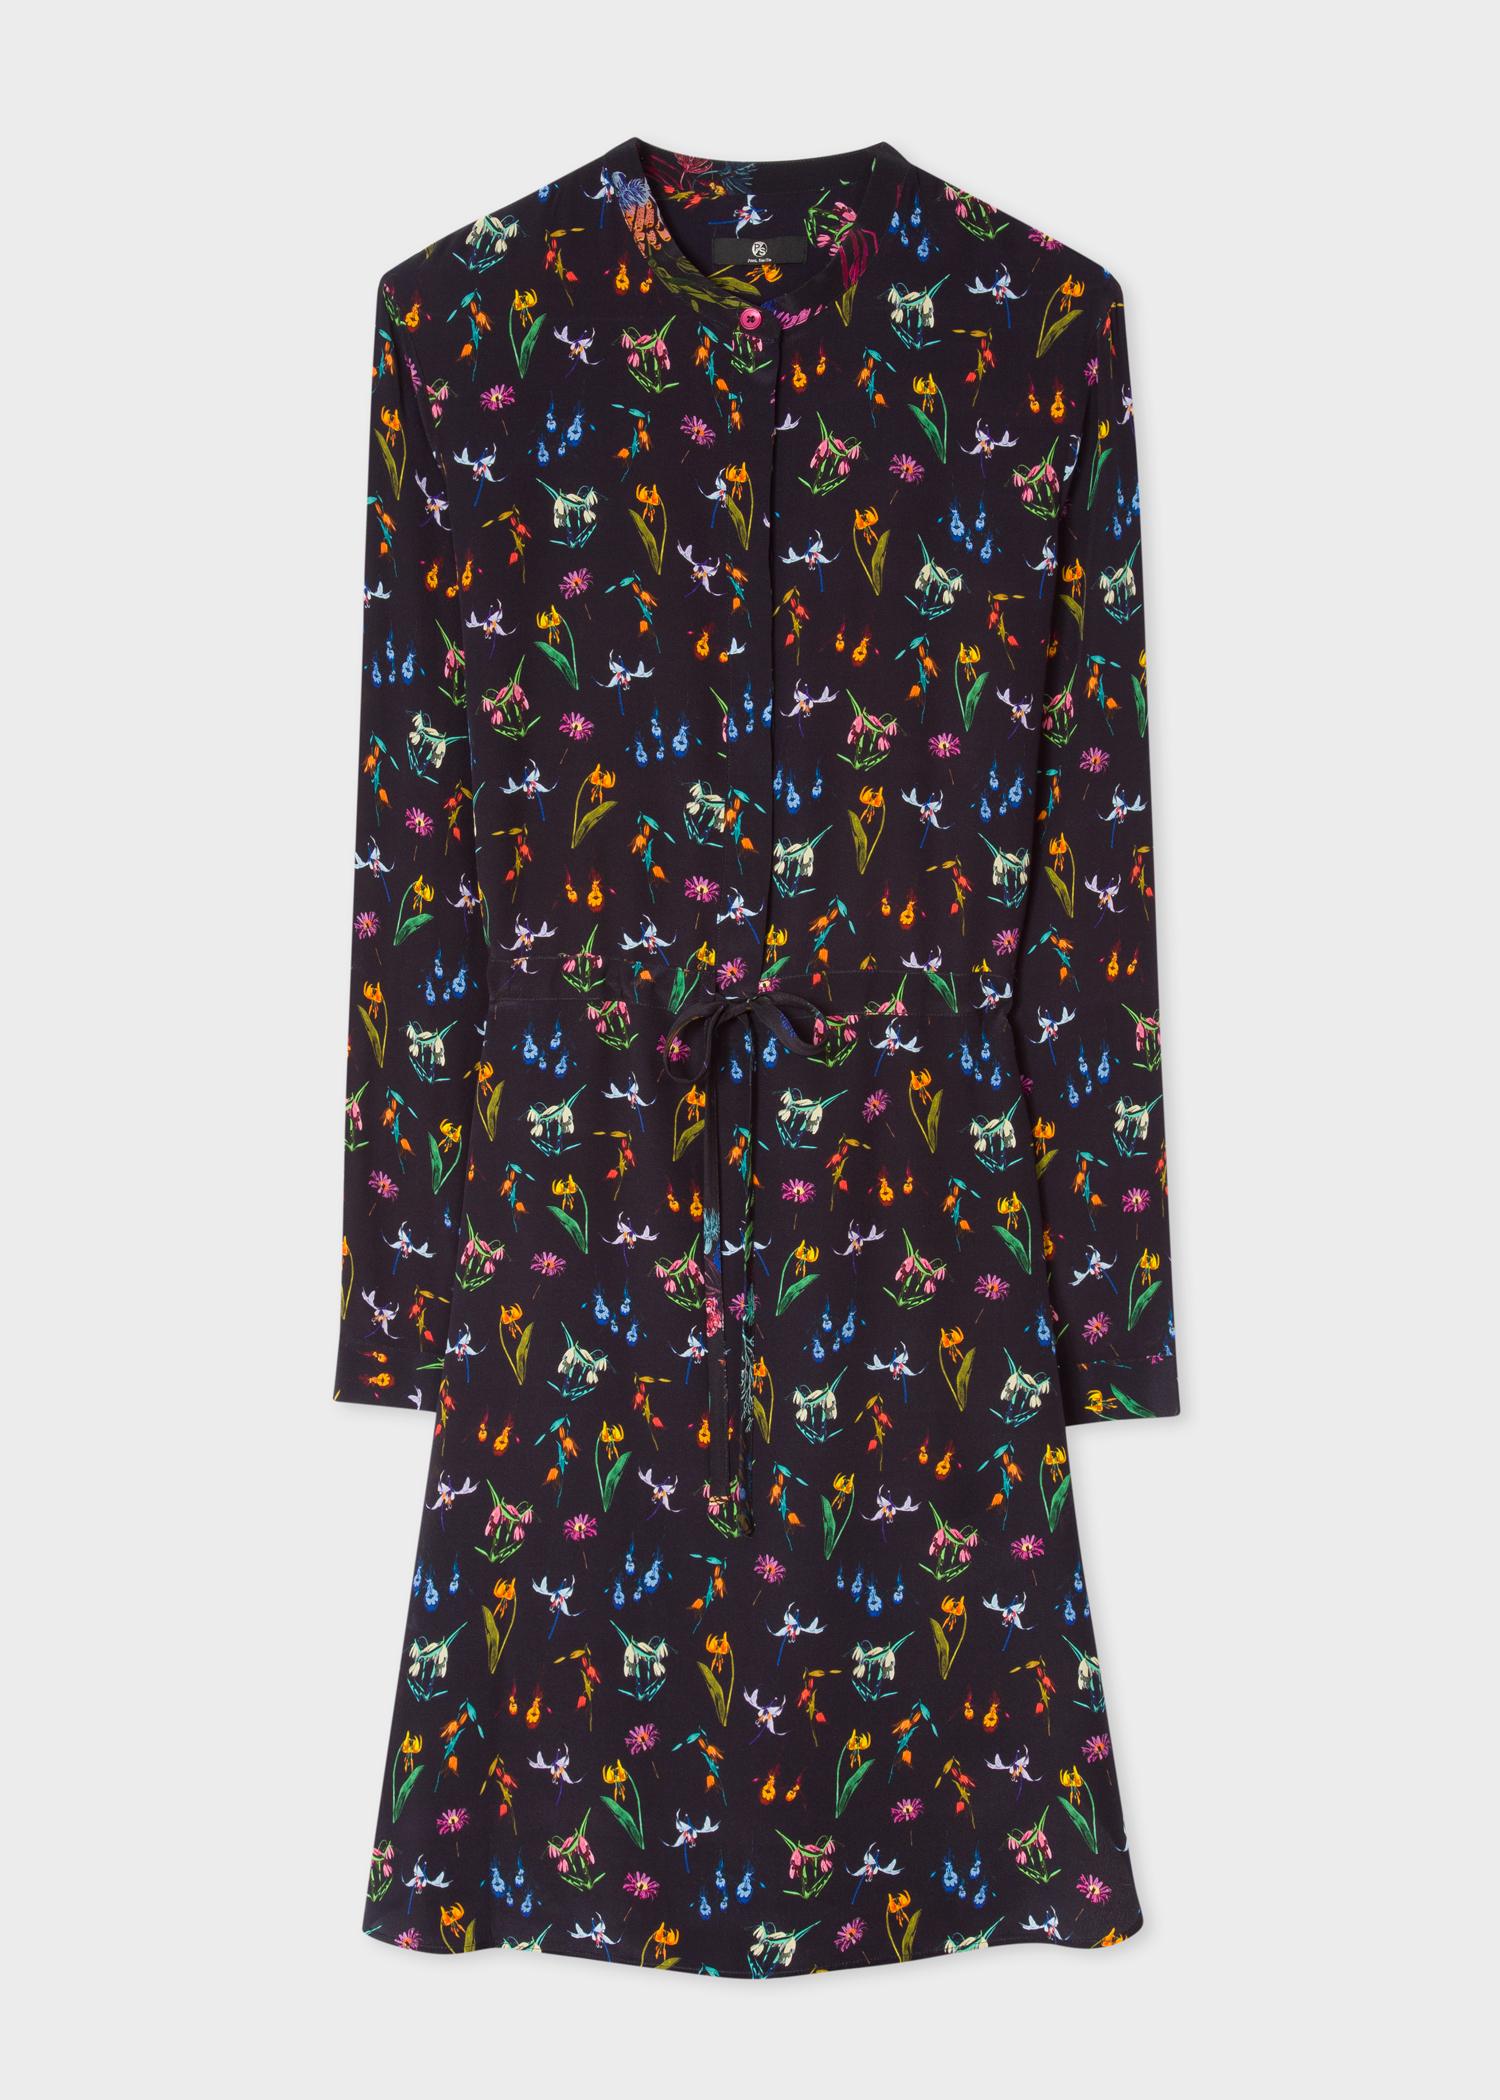 07358e949827ca Women's Black 'Floral' Print Silk Shirt Dress - Paul Smith Denmark